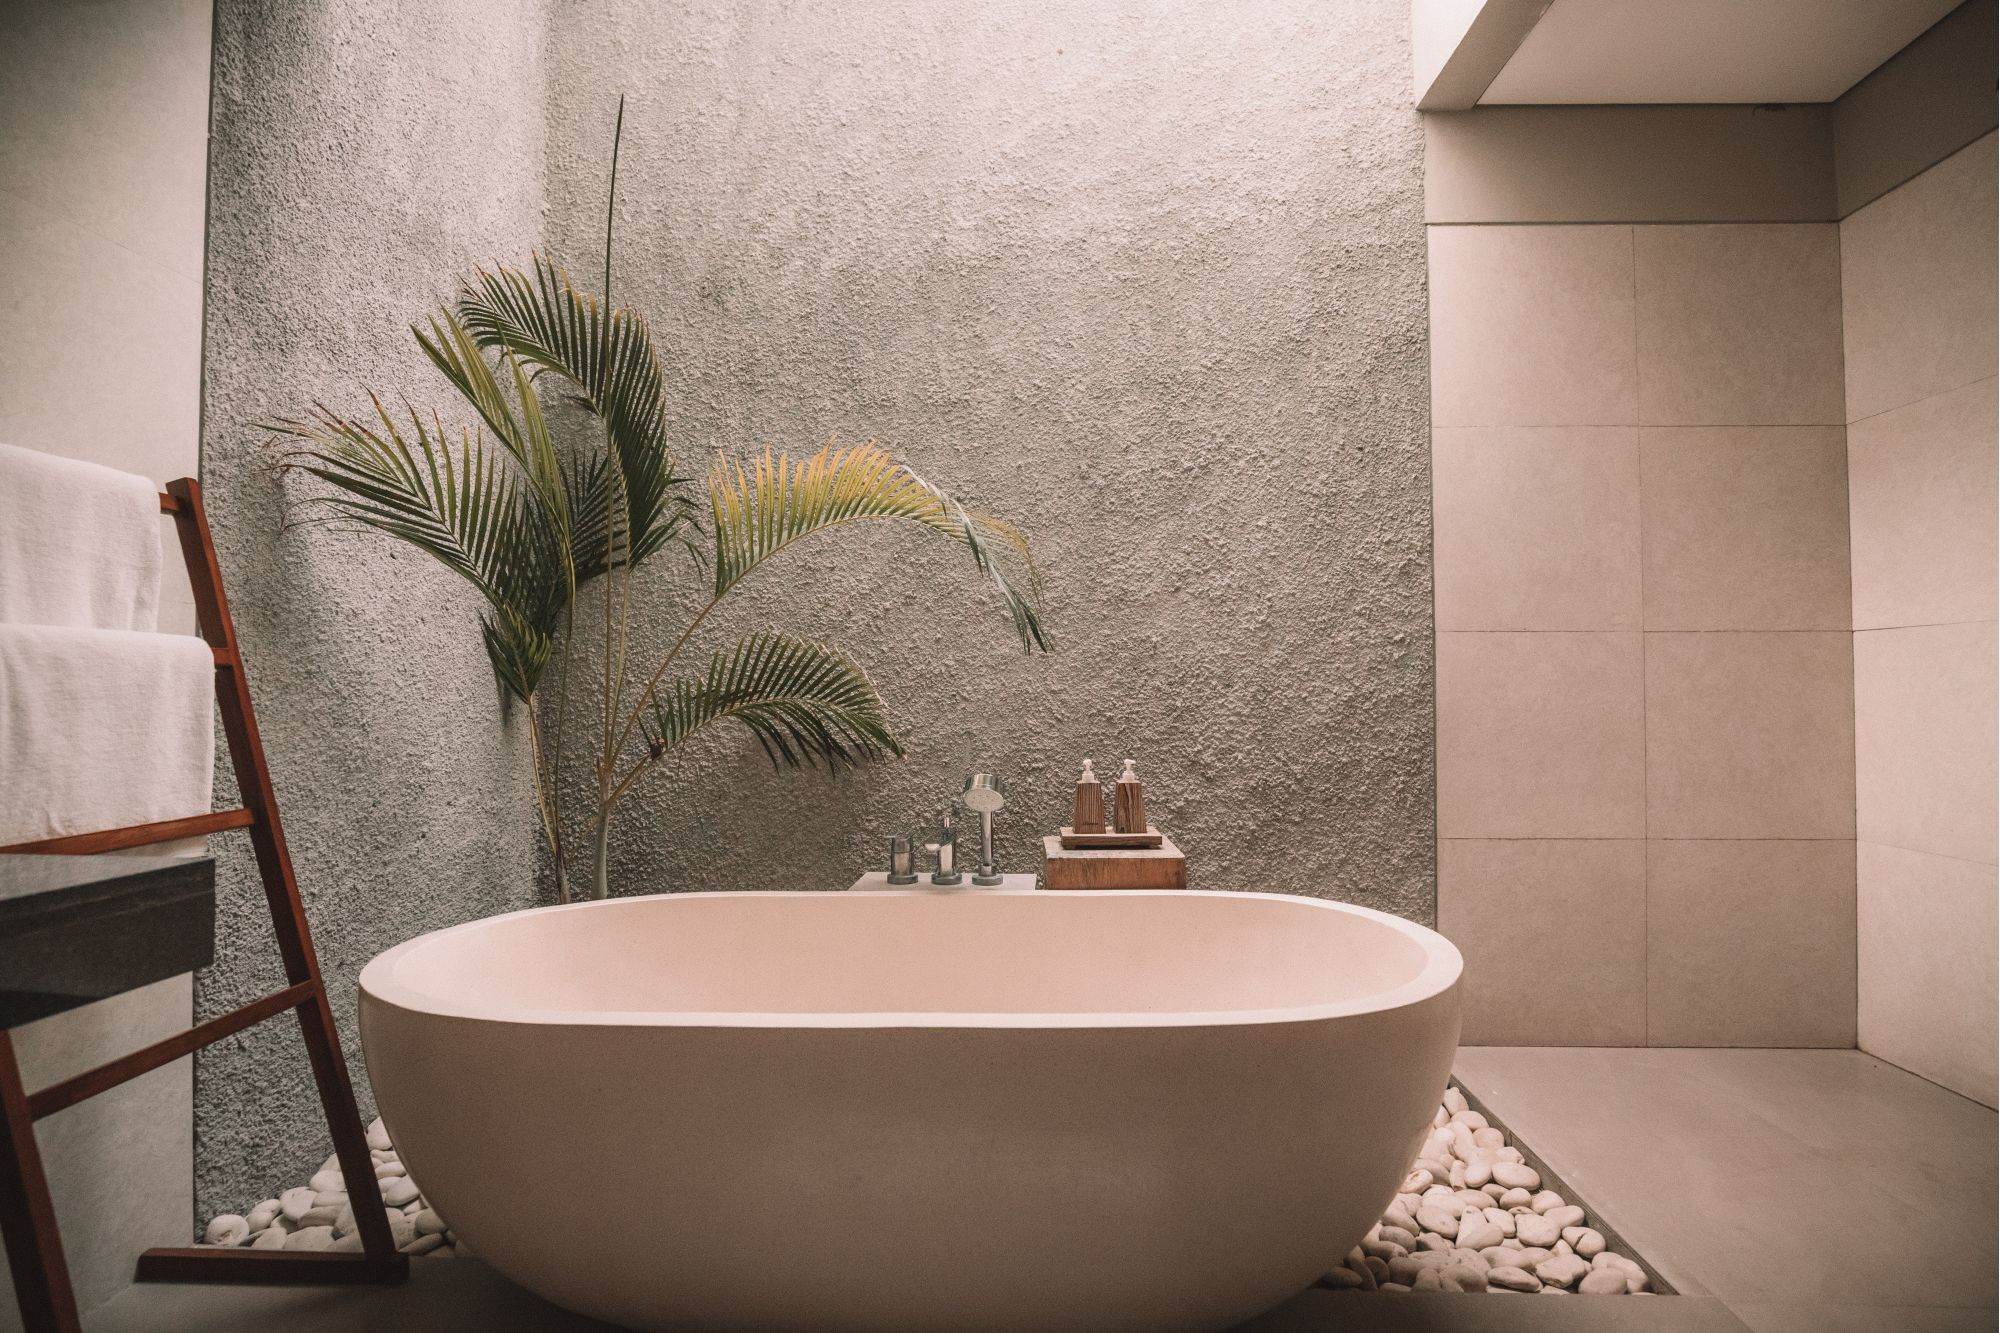 Bagno di design: vasca unica protagonista